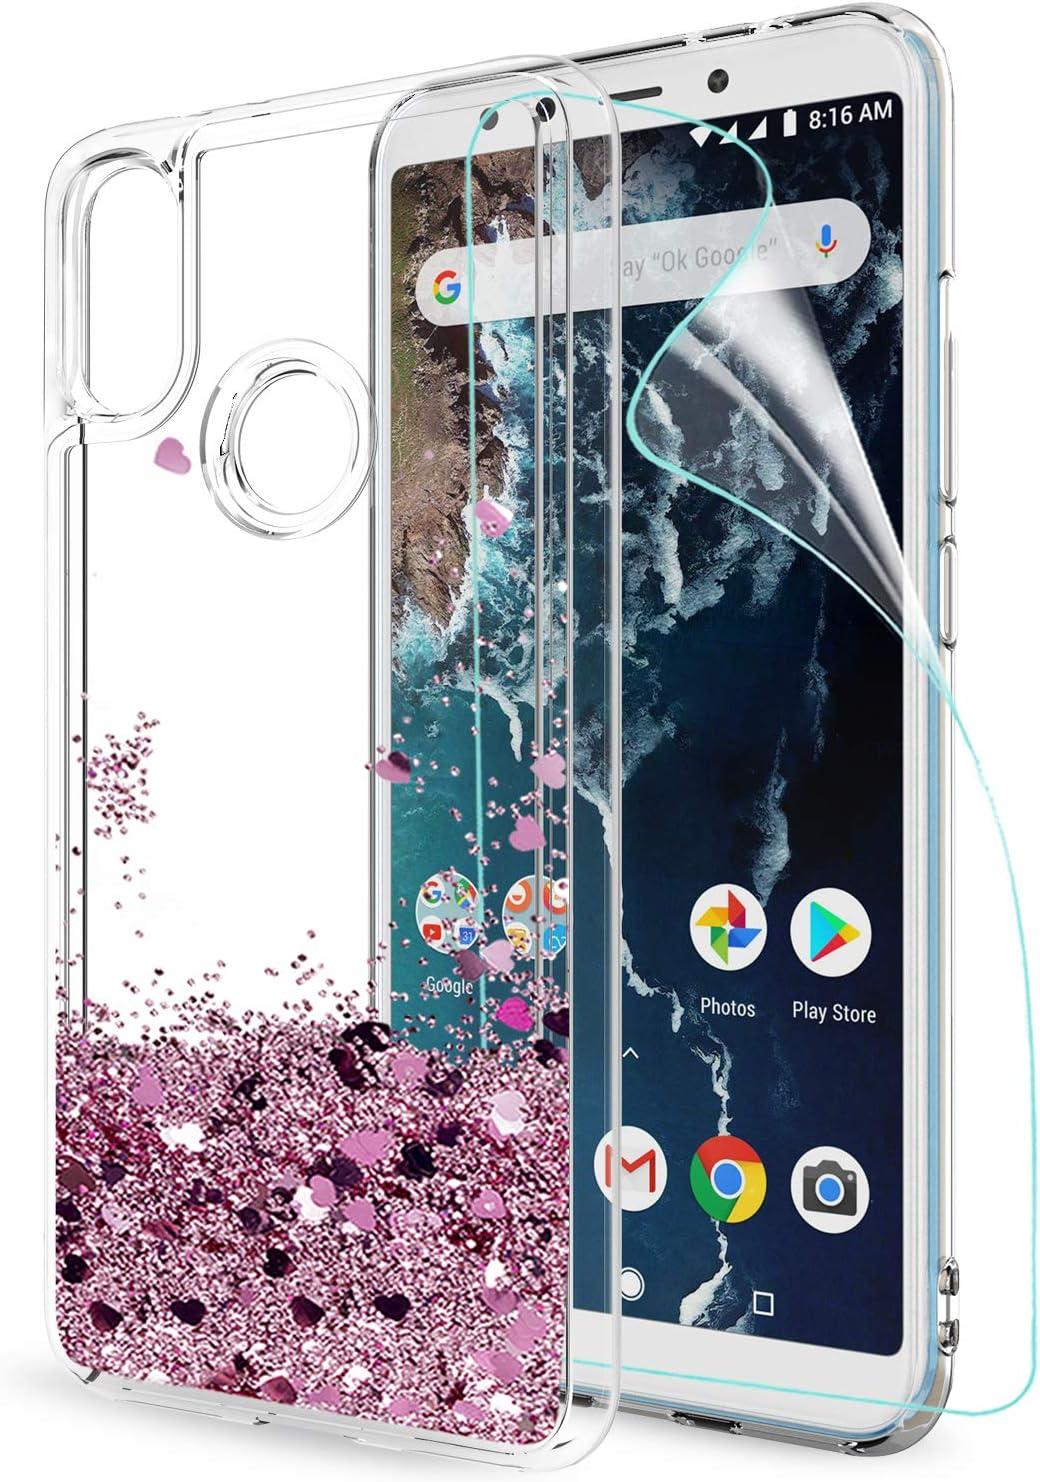 LeYi Funda Xiaomi Mi A2 / Mi 6X Silicona Purpurina Carcasa con HD Protectores de Pantalla, Transparente Cristal Bumper Telefono Gel TPU Fundas Case Cover para Movil Xiaomi Mi A2 ZX Oro Rosa